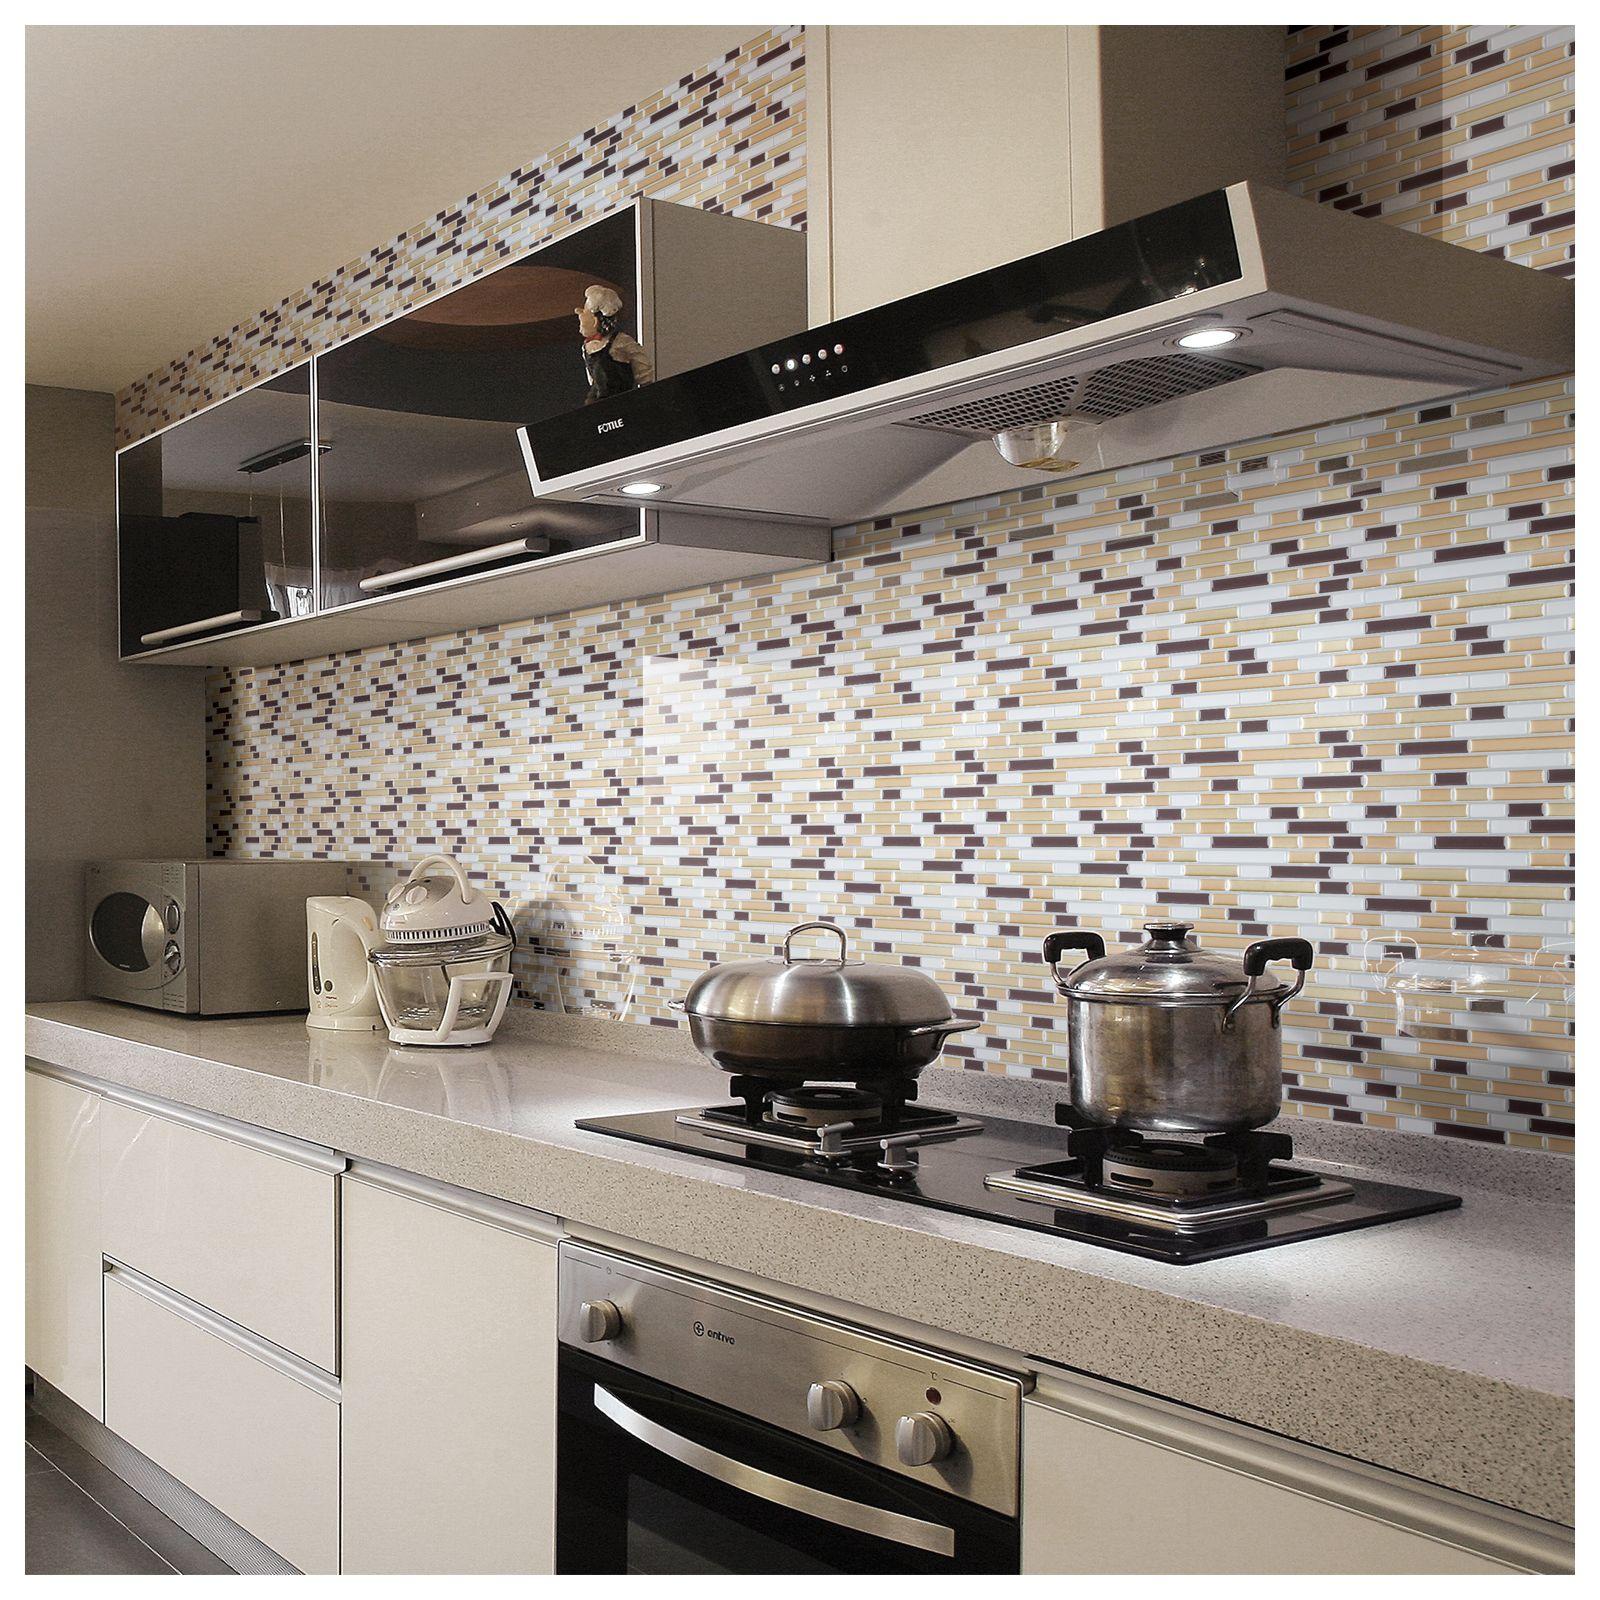 peel and stick wall tile kitchen and bathroom backsplashes tile rh pinterest co uk Peel and Stick Tiles for Living Room Wall Peel and Stick Tiles for Living Room Wall